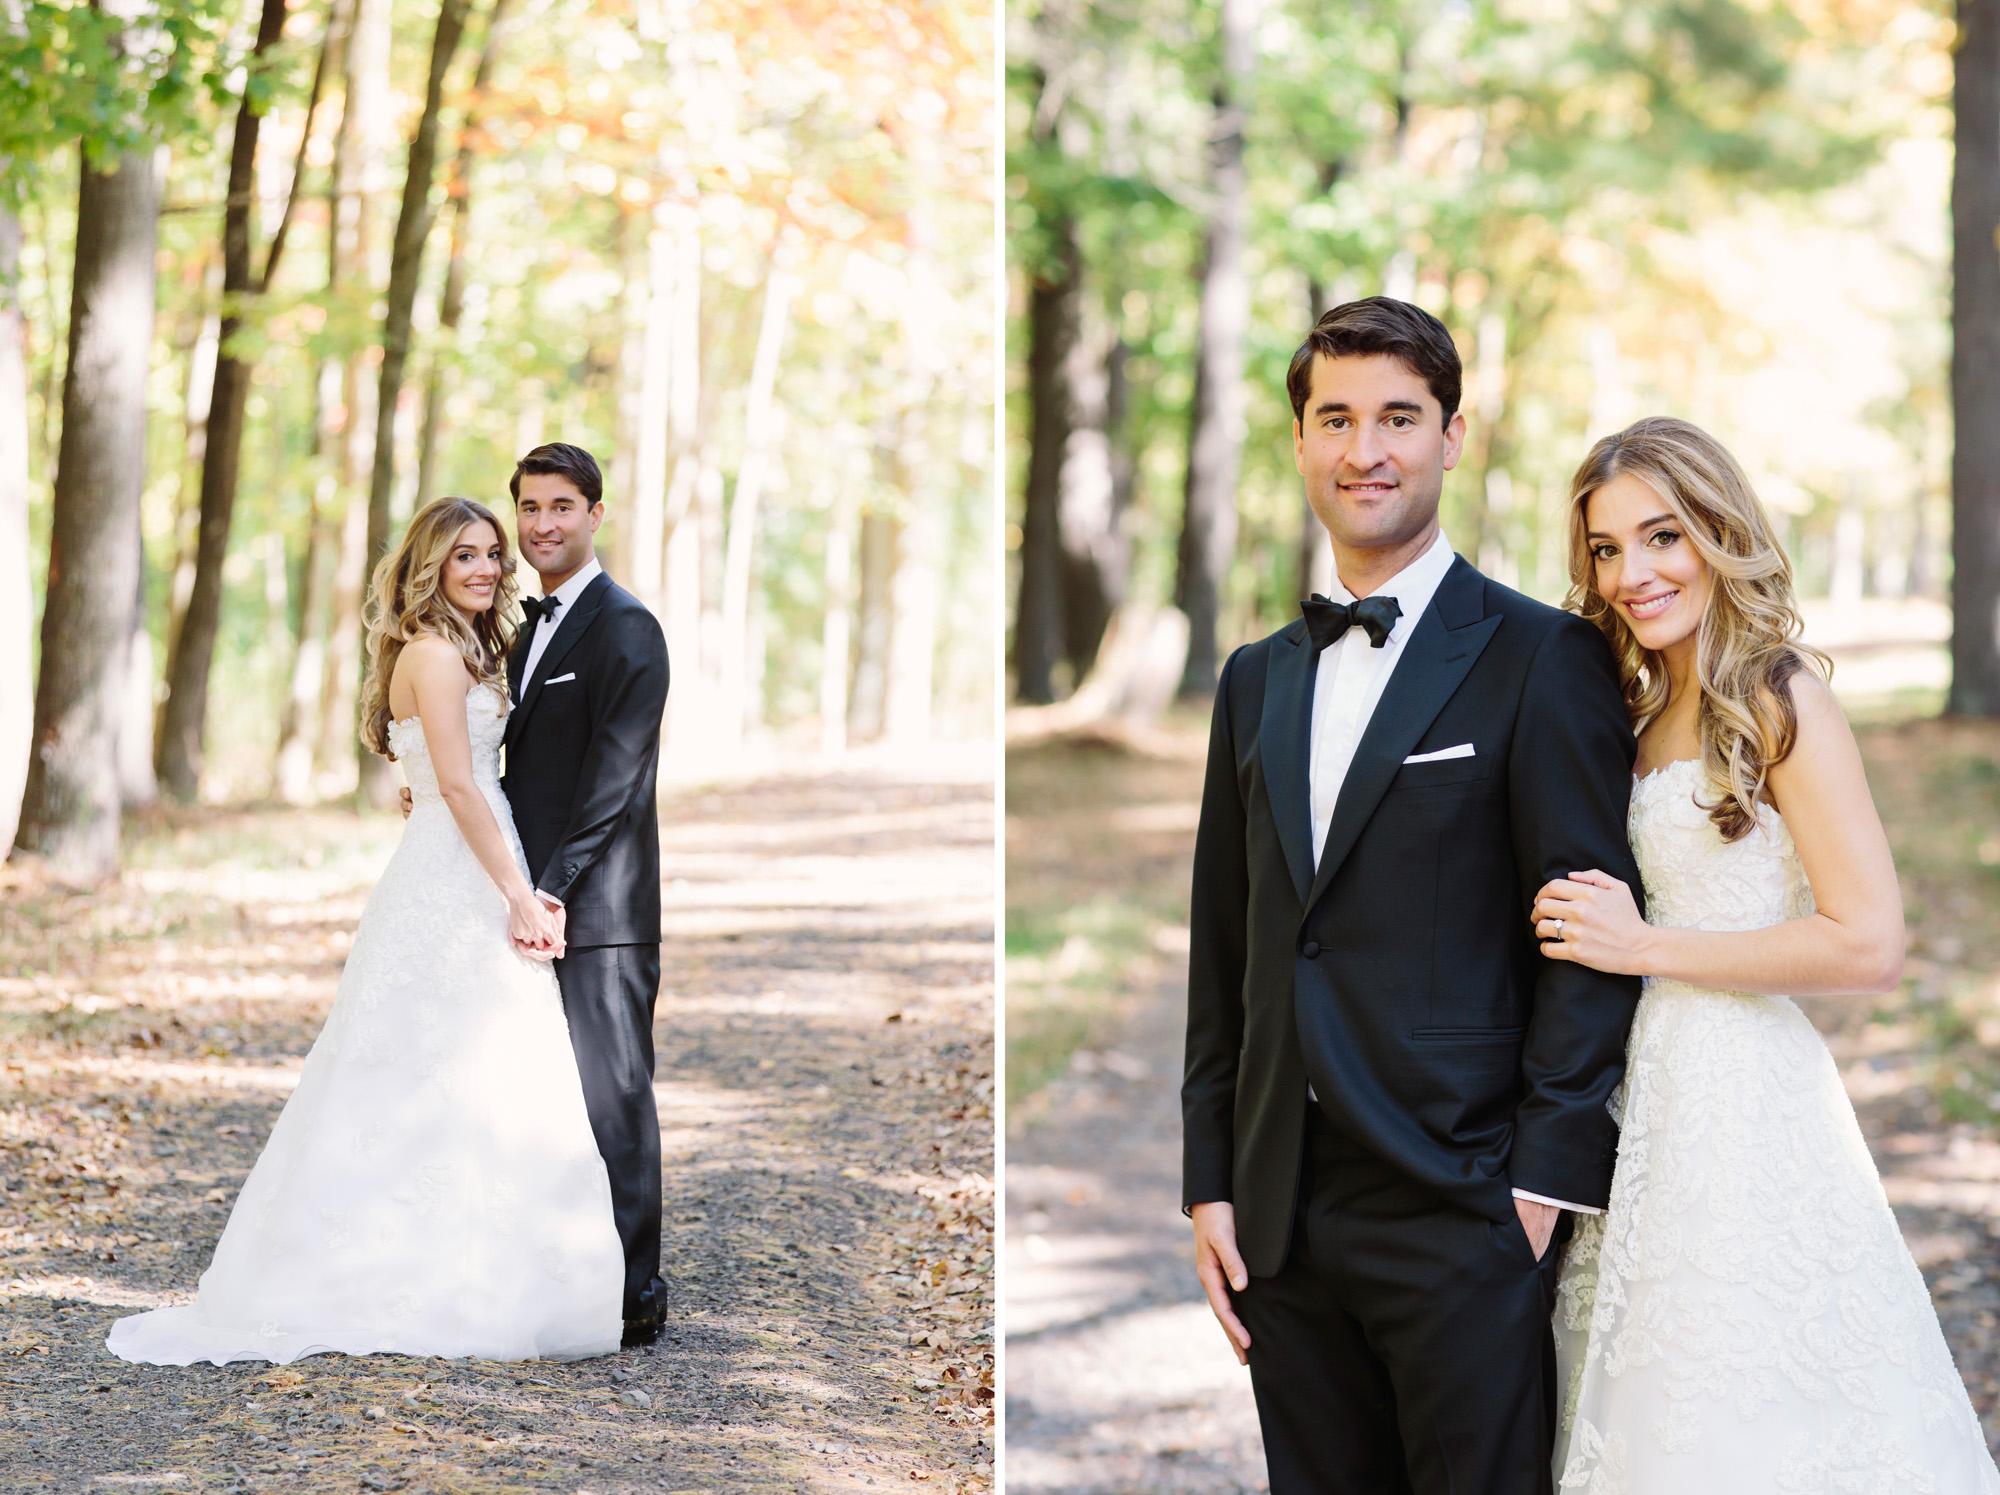 25a_Christina_Daniel_Hamilton_Farm_Golf_Club_Wedding_NJ_Tanya_Salazar_Photography.jpg